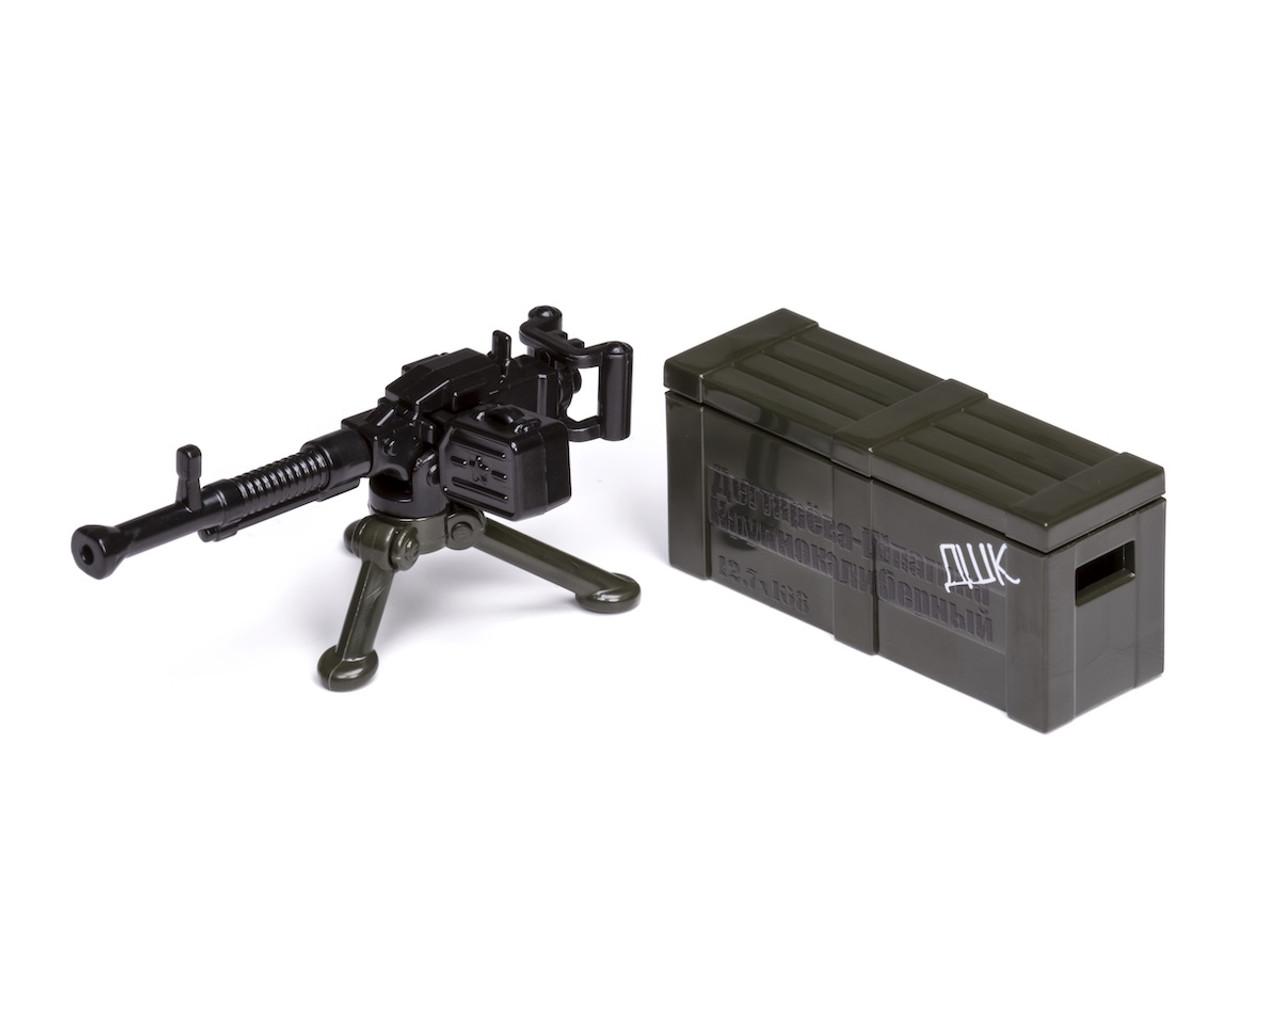 BrickArms DShK Russian Heavy Machine Gun Accessory for LEGO Minifigures NEW